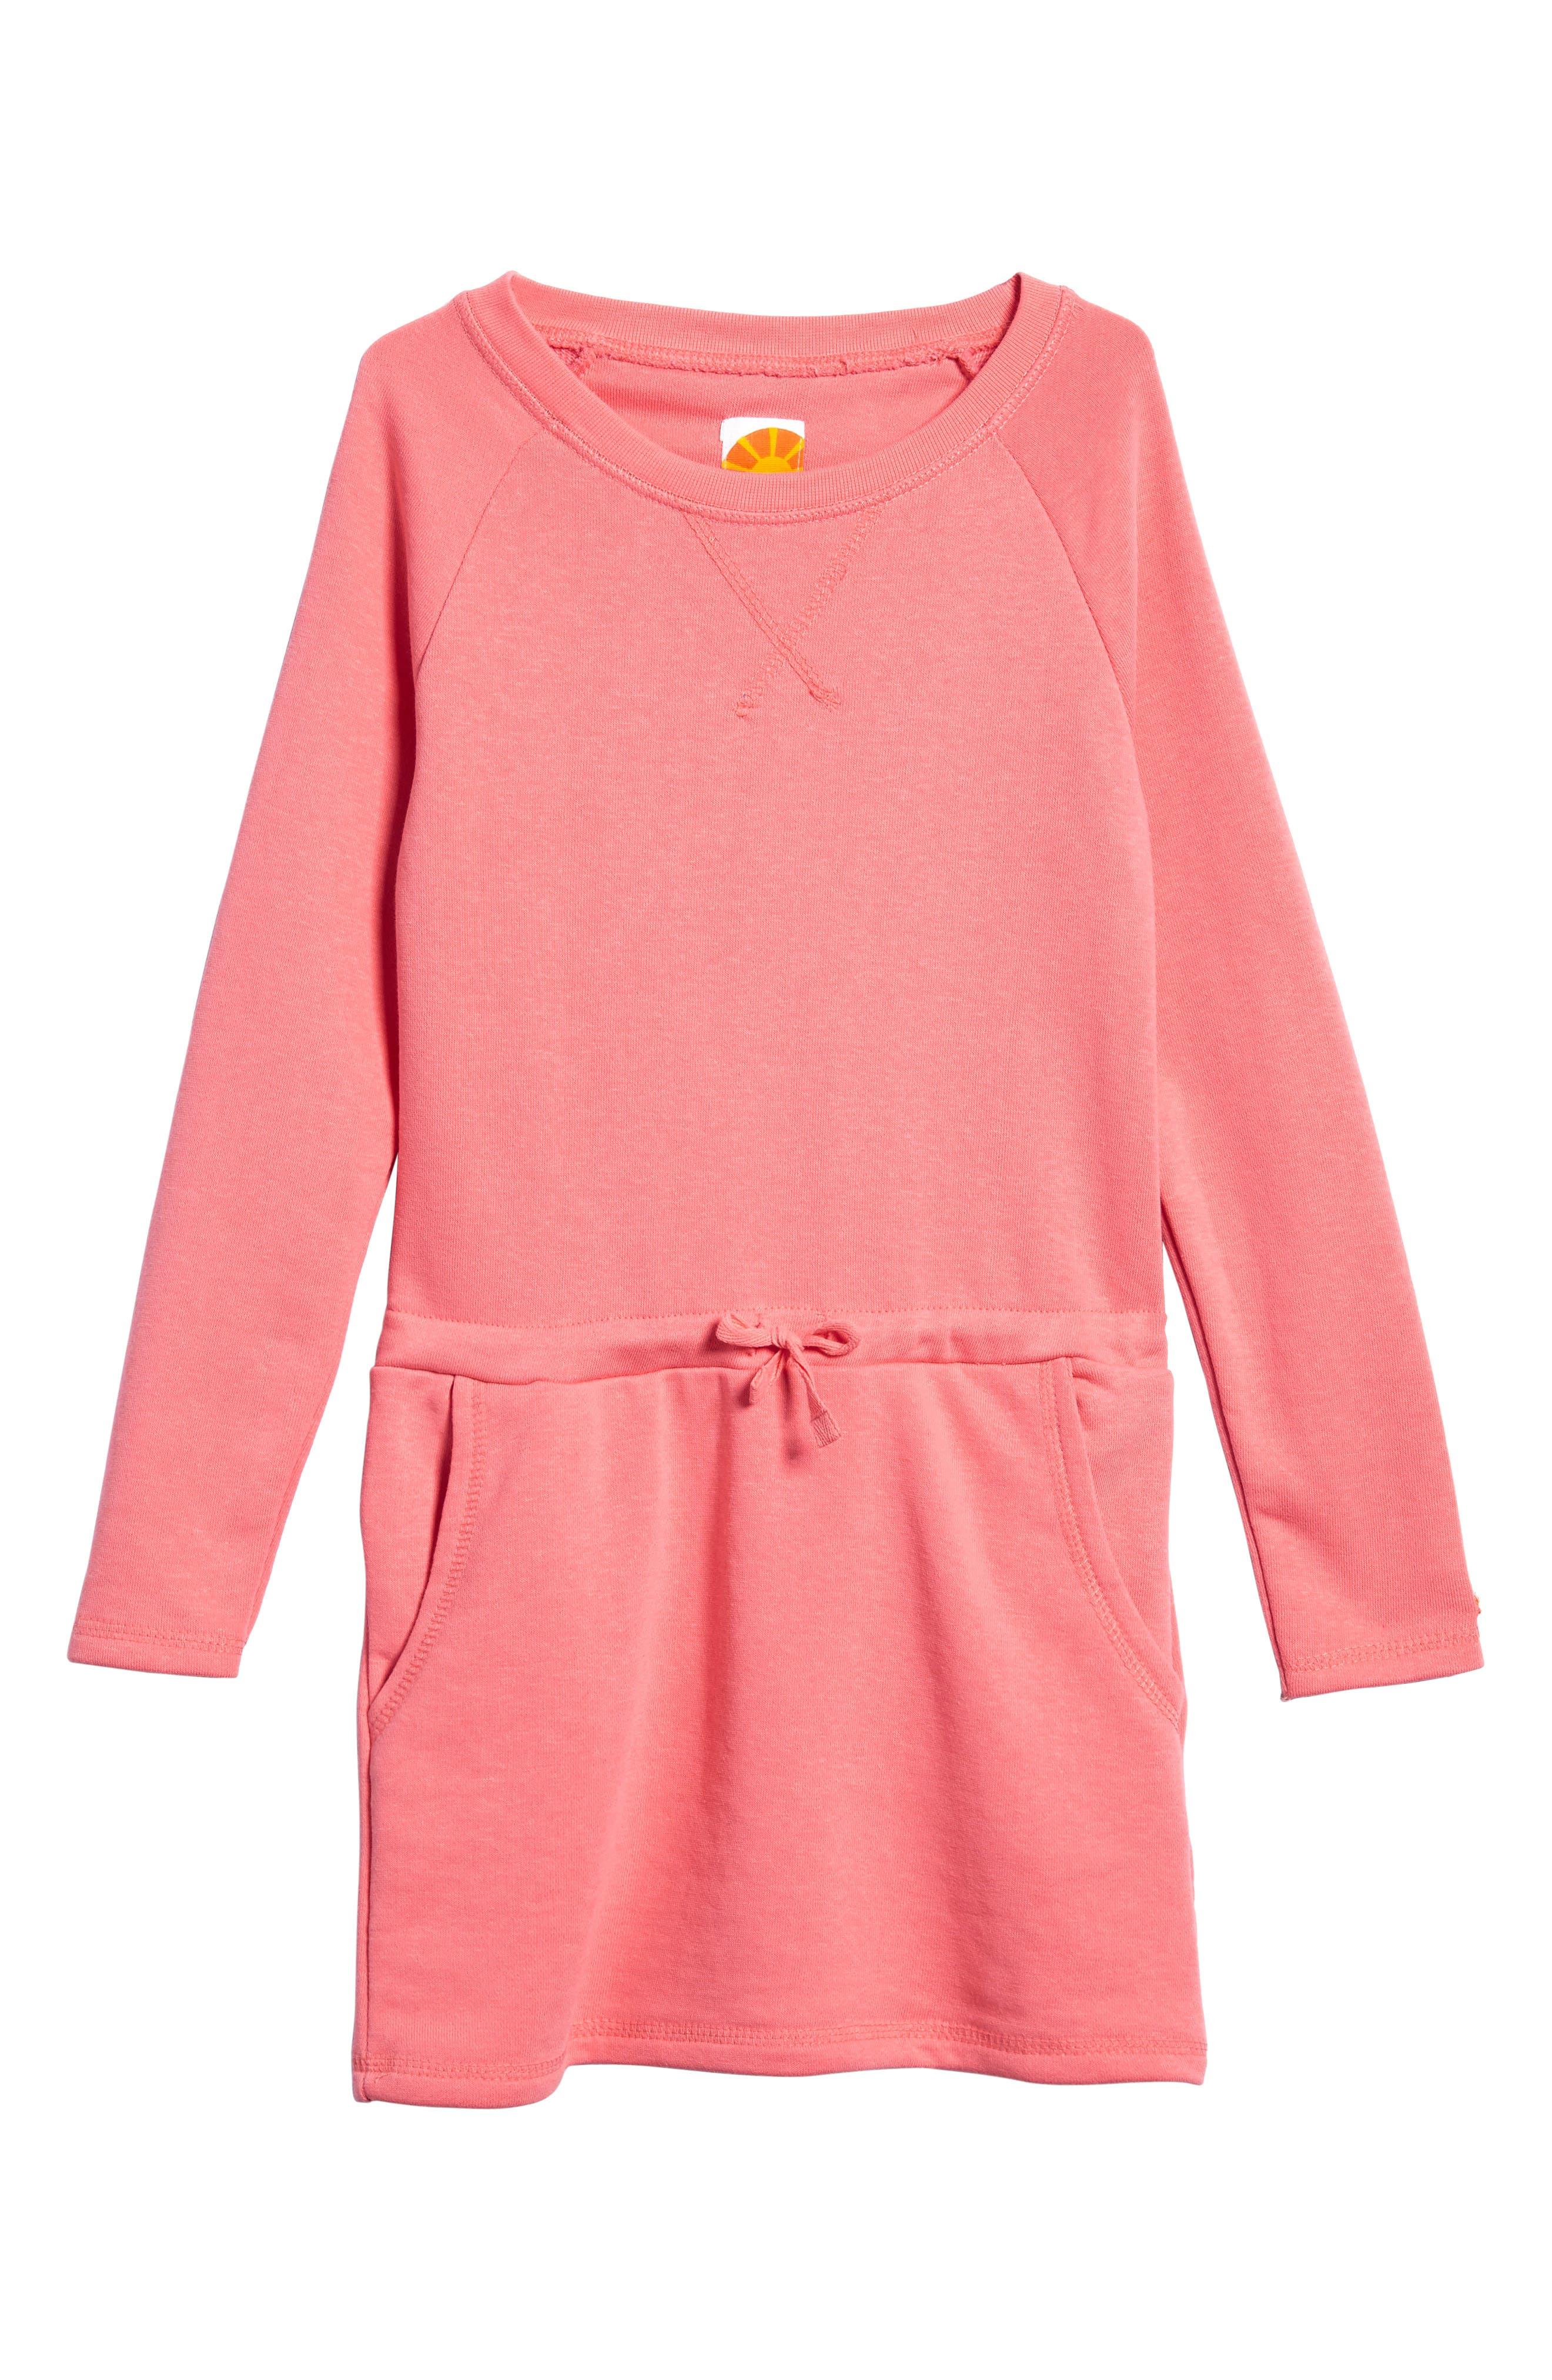 Alternate Image 1 Selected - C & C California Sweatshirt Dress (Big Girls)